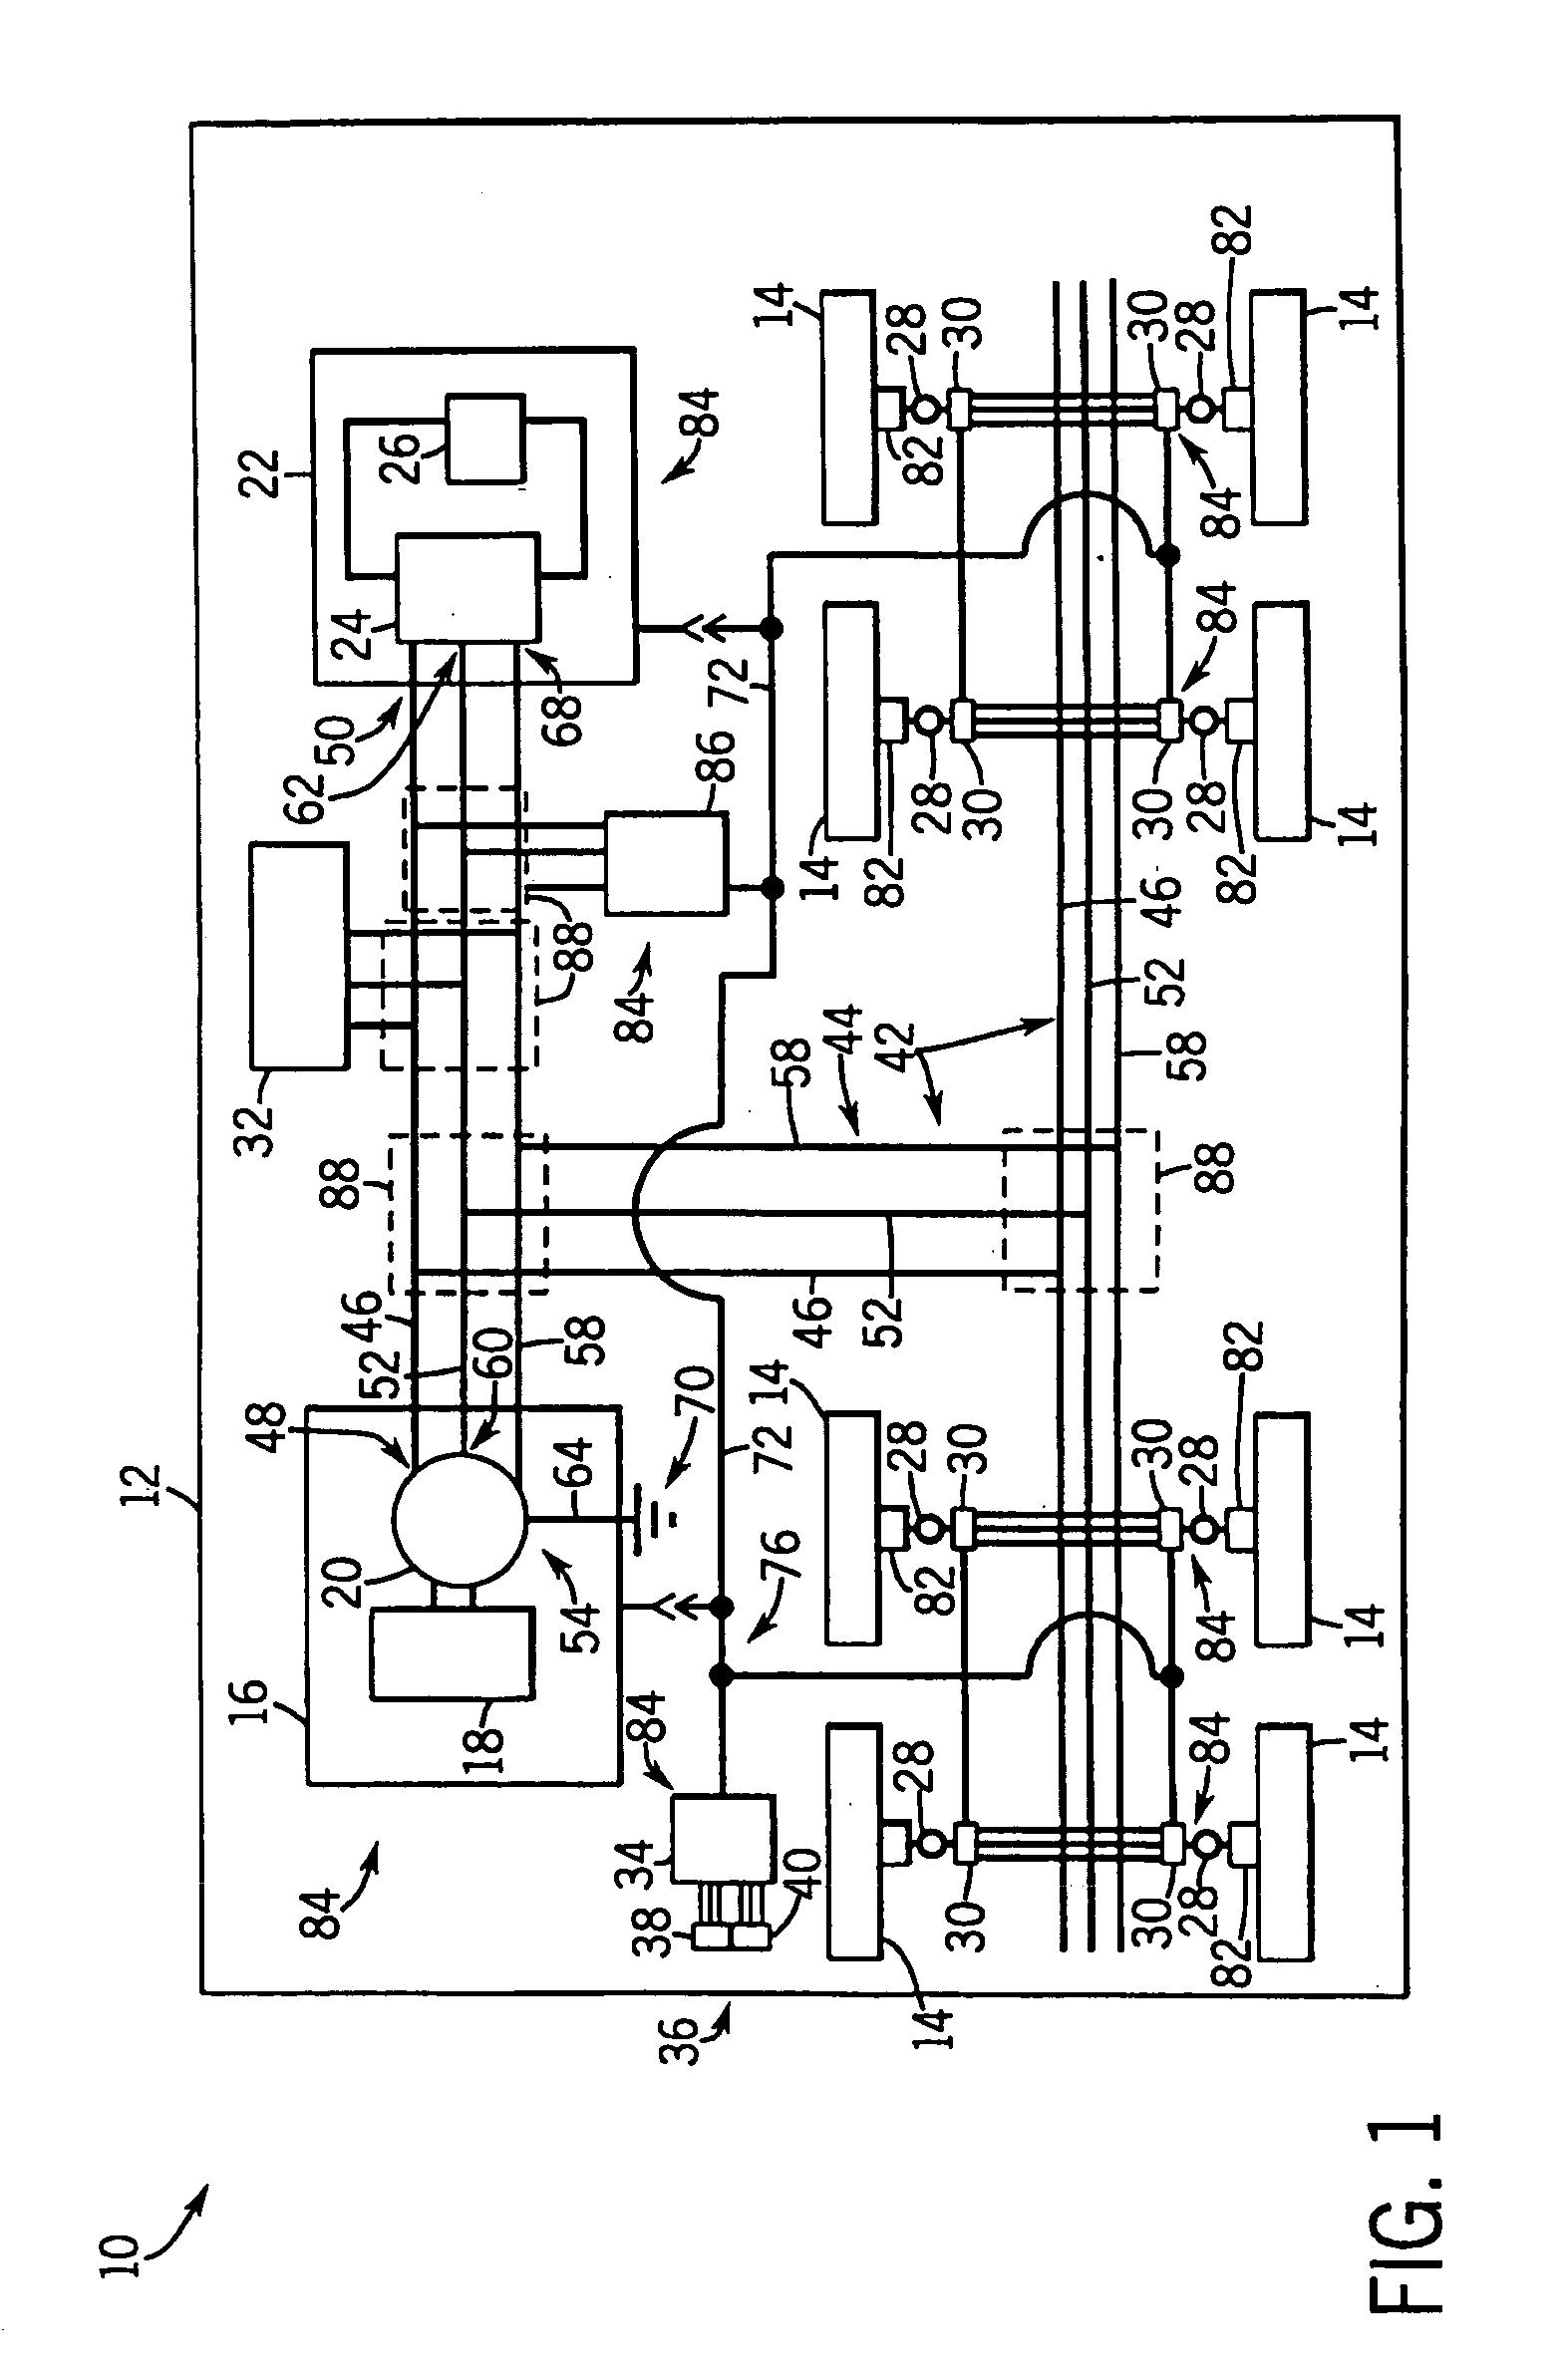 Mcneilus Mixer Wiring Diagram : 29 Wiring Diagram Images